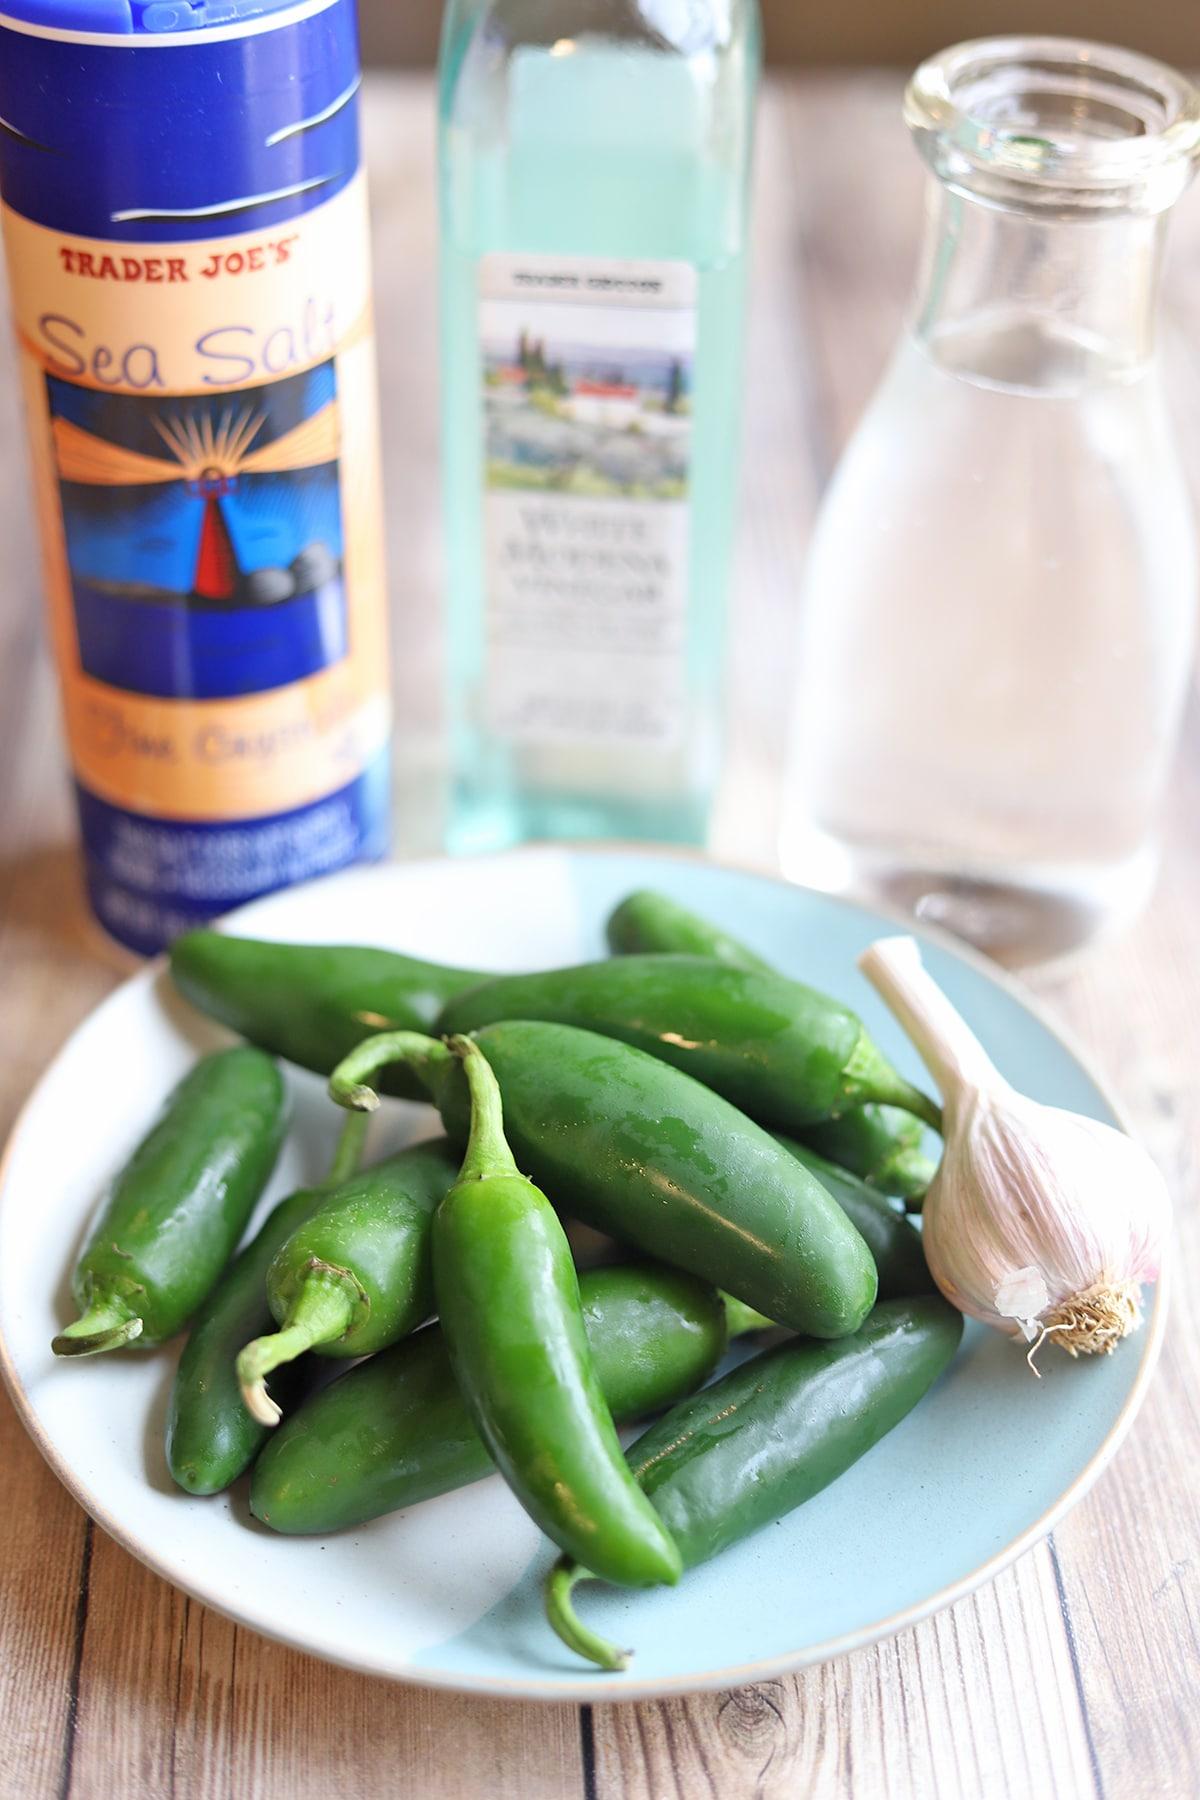 Ingredients for quick pickled jalapenos: jalapeno peppers, salt, vinegar, water, and garlic.